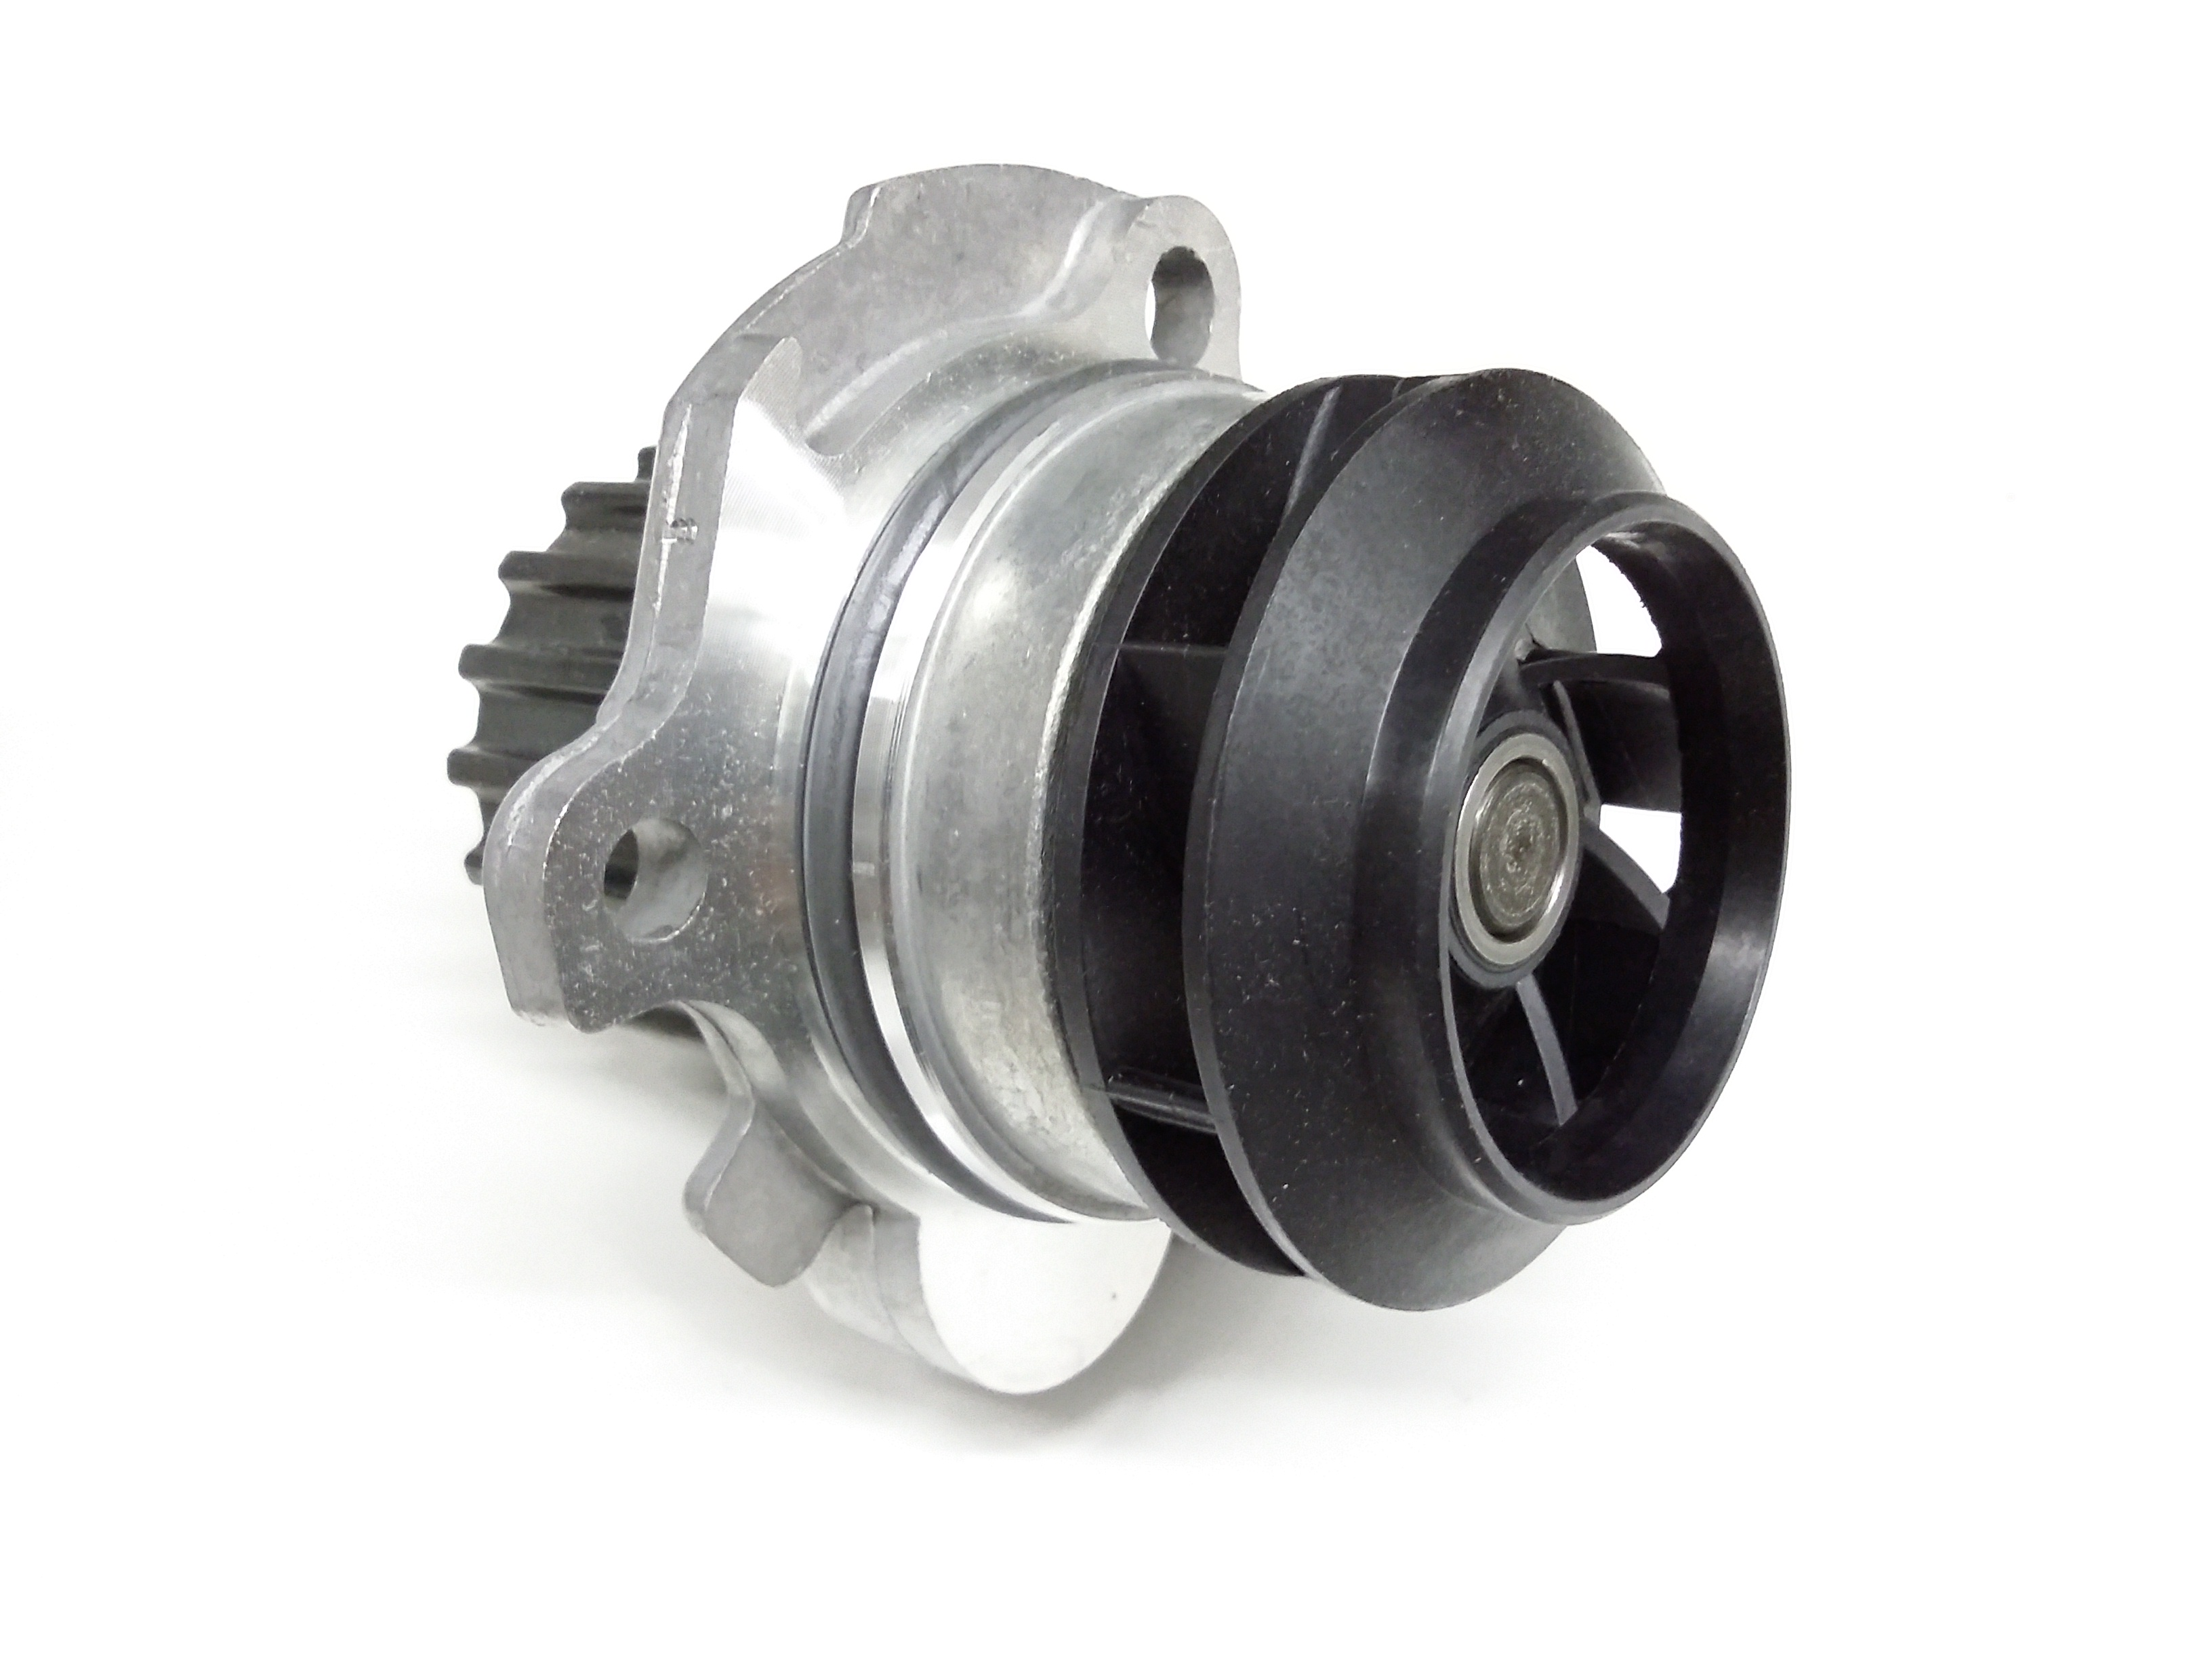 1999 volkswagen beetle engine water pump water pump incl for Vw beetle motor parts